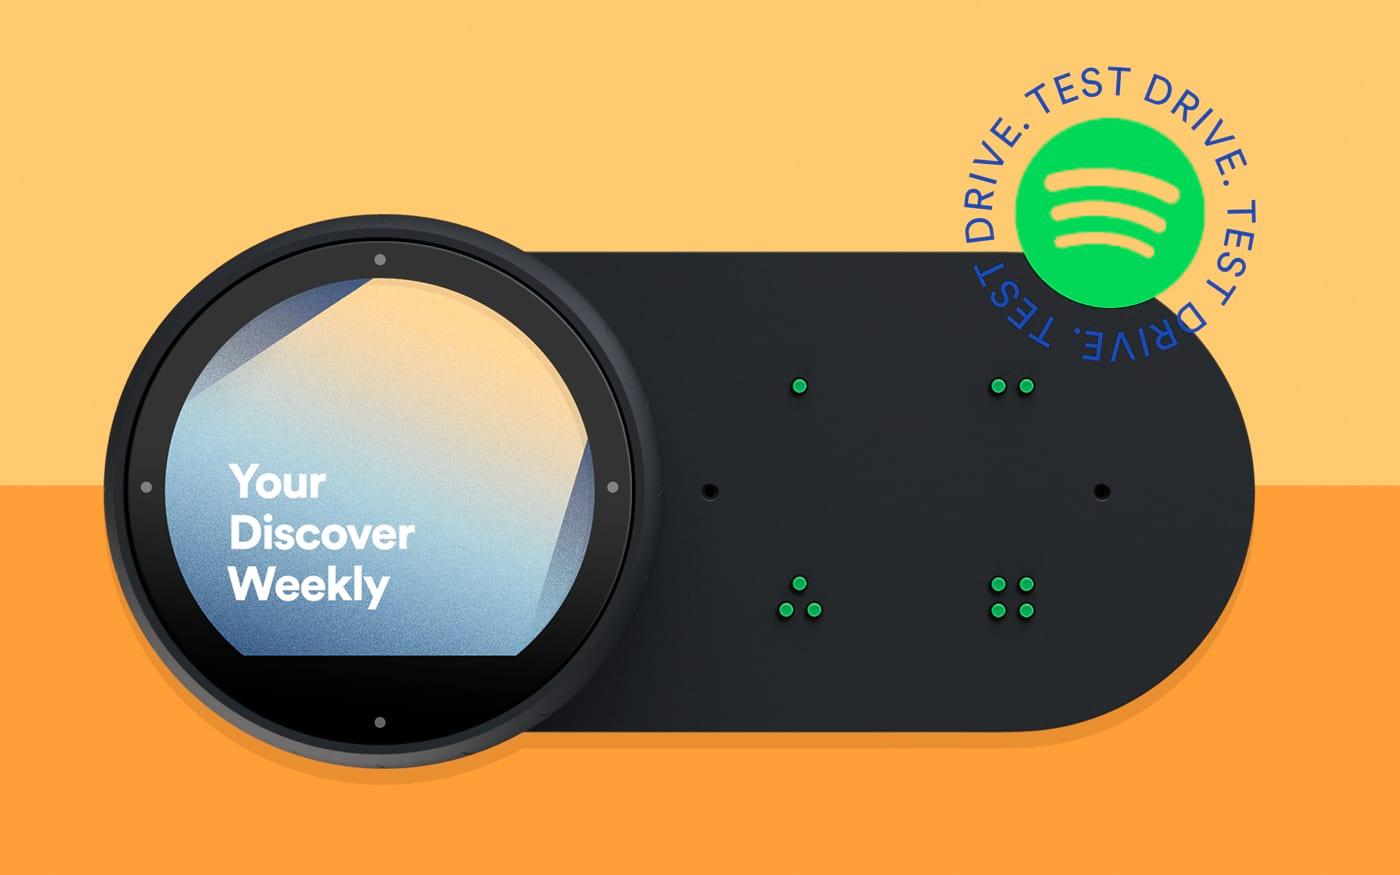 Car Thing: Hardware do Spotify permitirá controlar o spotify via voz